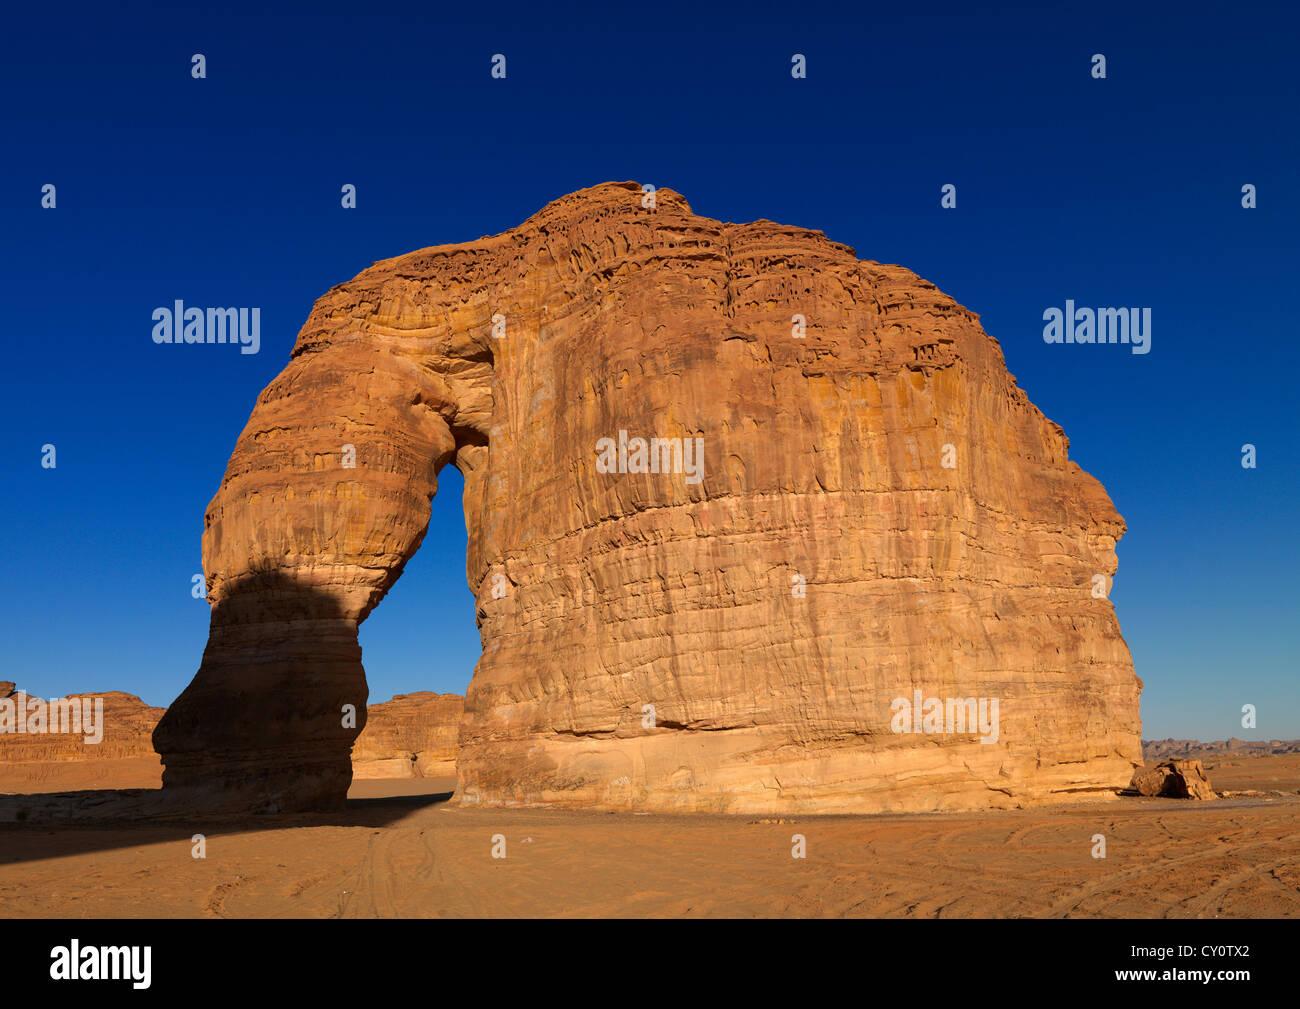 Elephant Rock en Madain Saleh emplazamiento arqueológico, Arabia Saudita Imagen De Stock